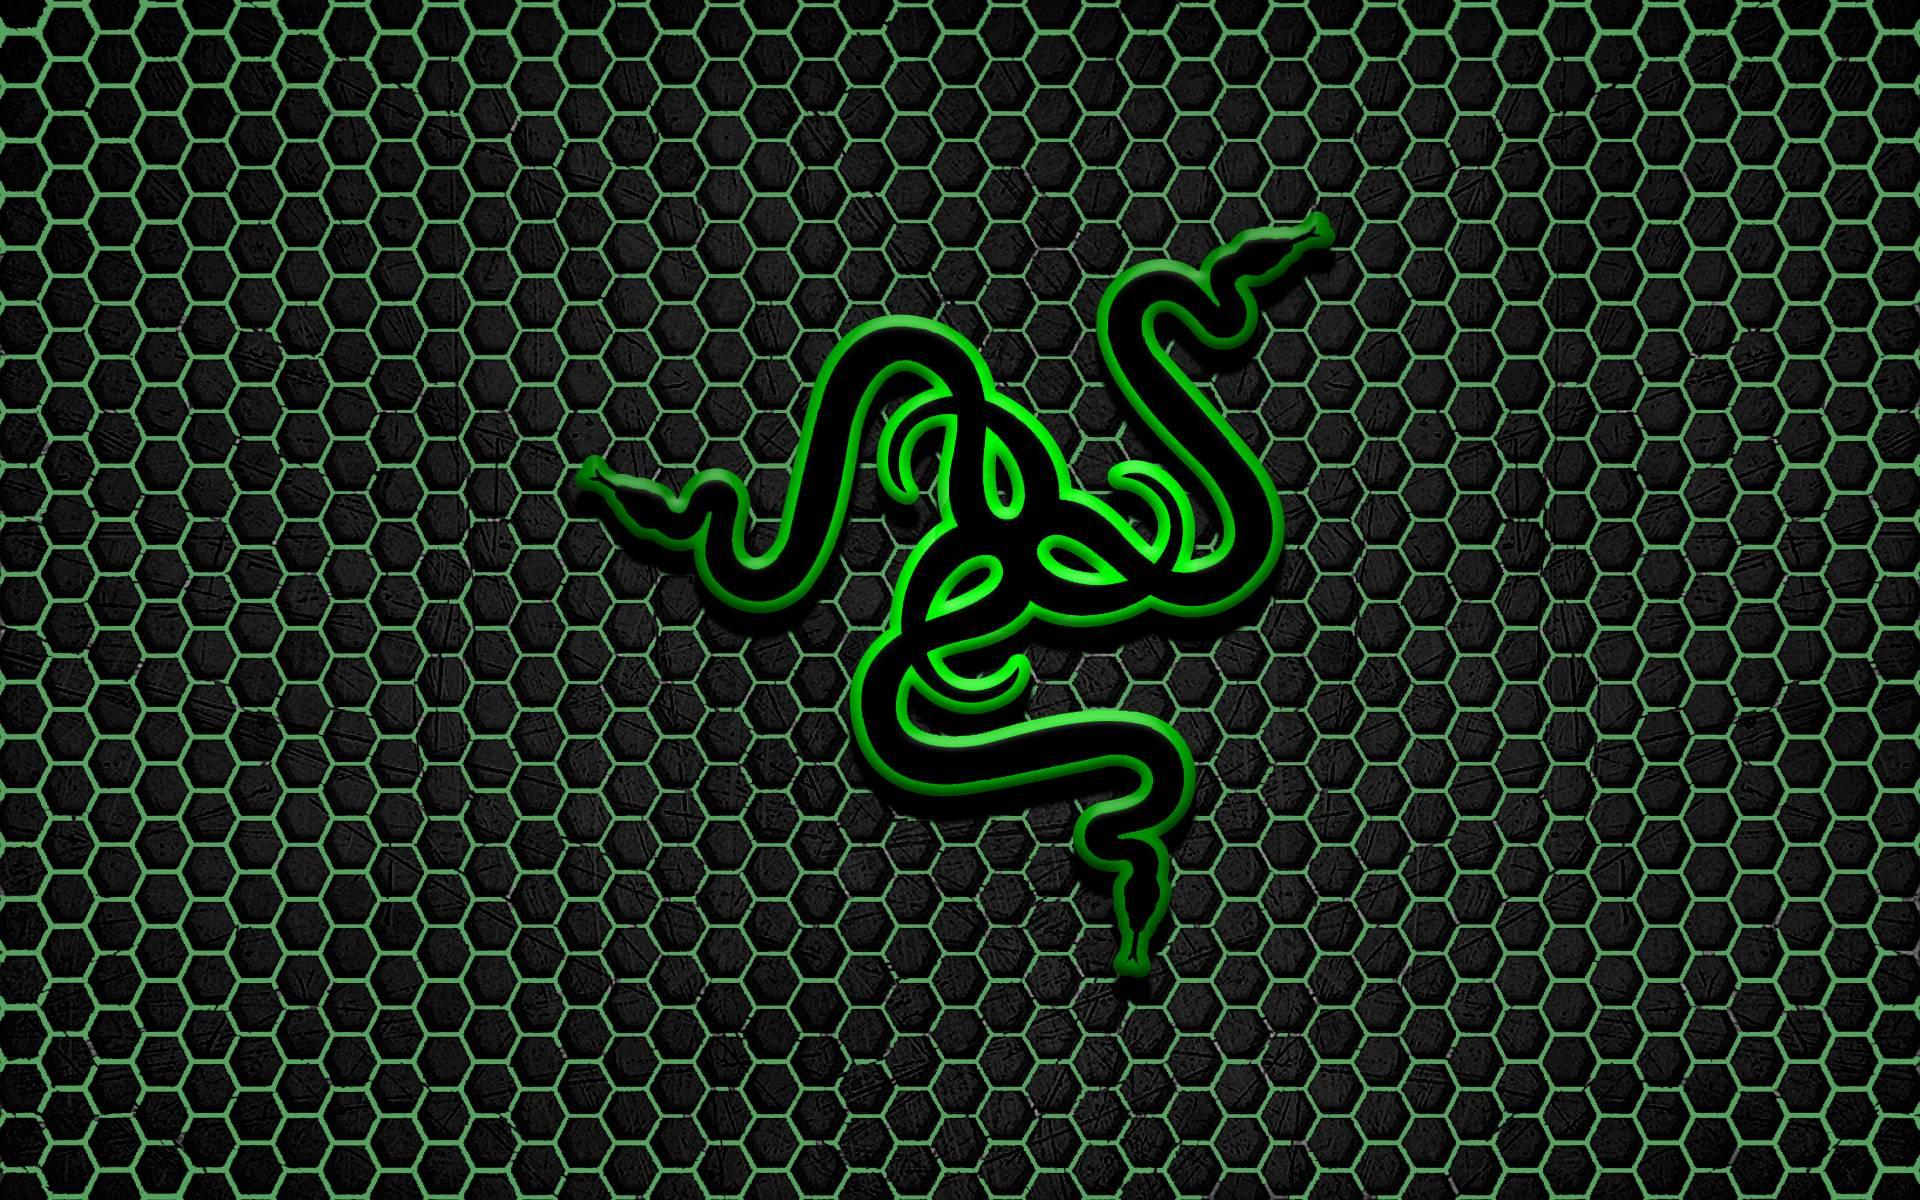 Razer logo wallpapers top free razer logo backgrounds - Gaming logo wallpaper ...